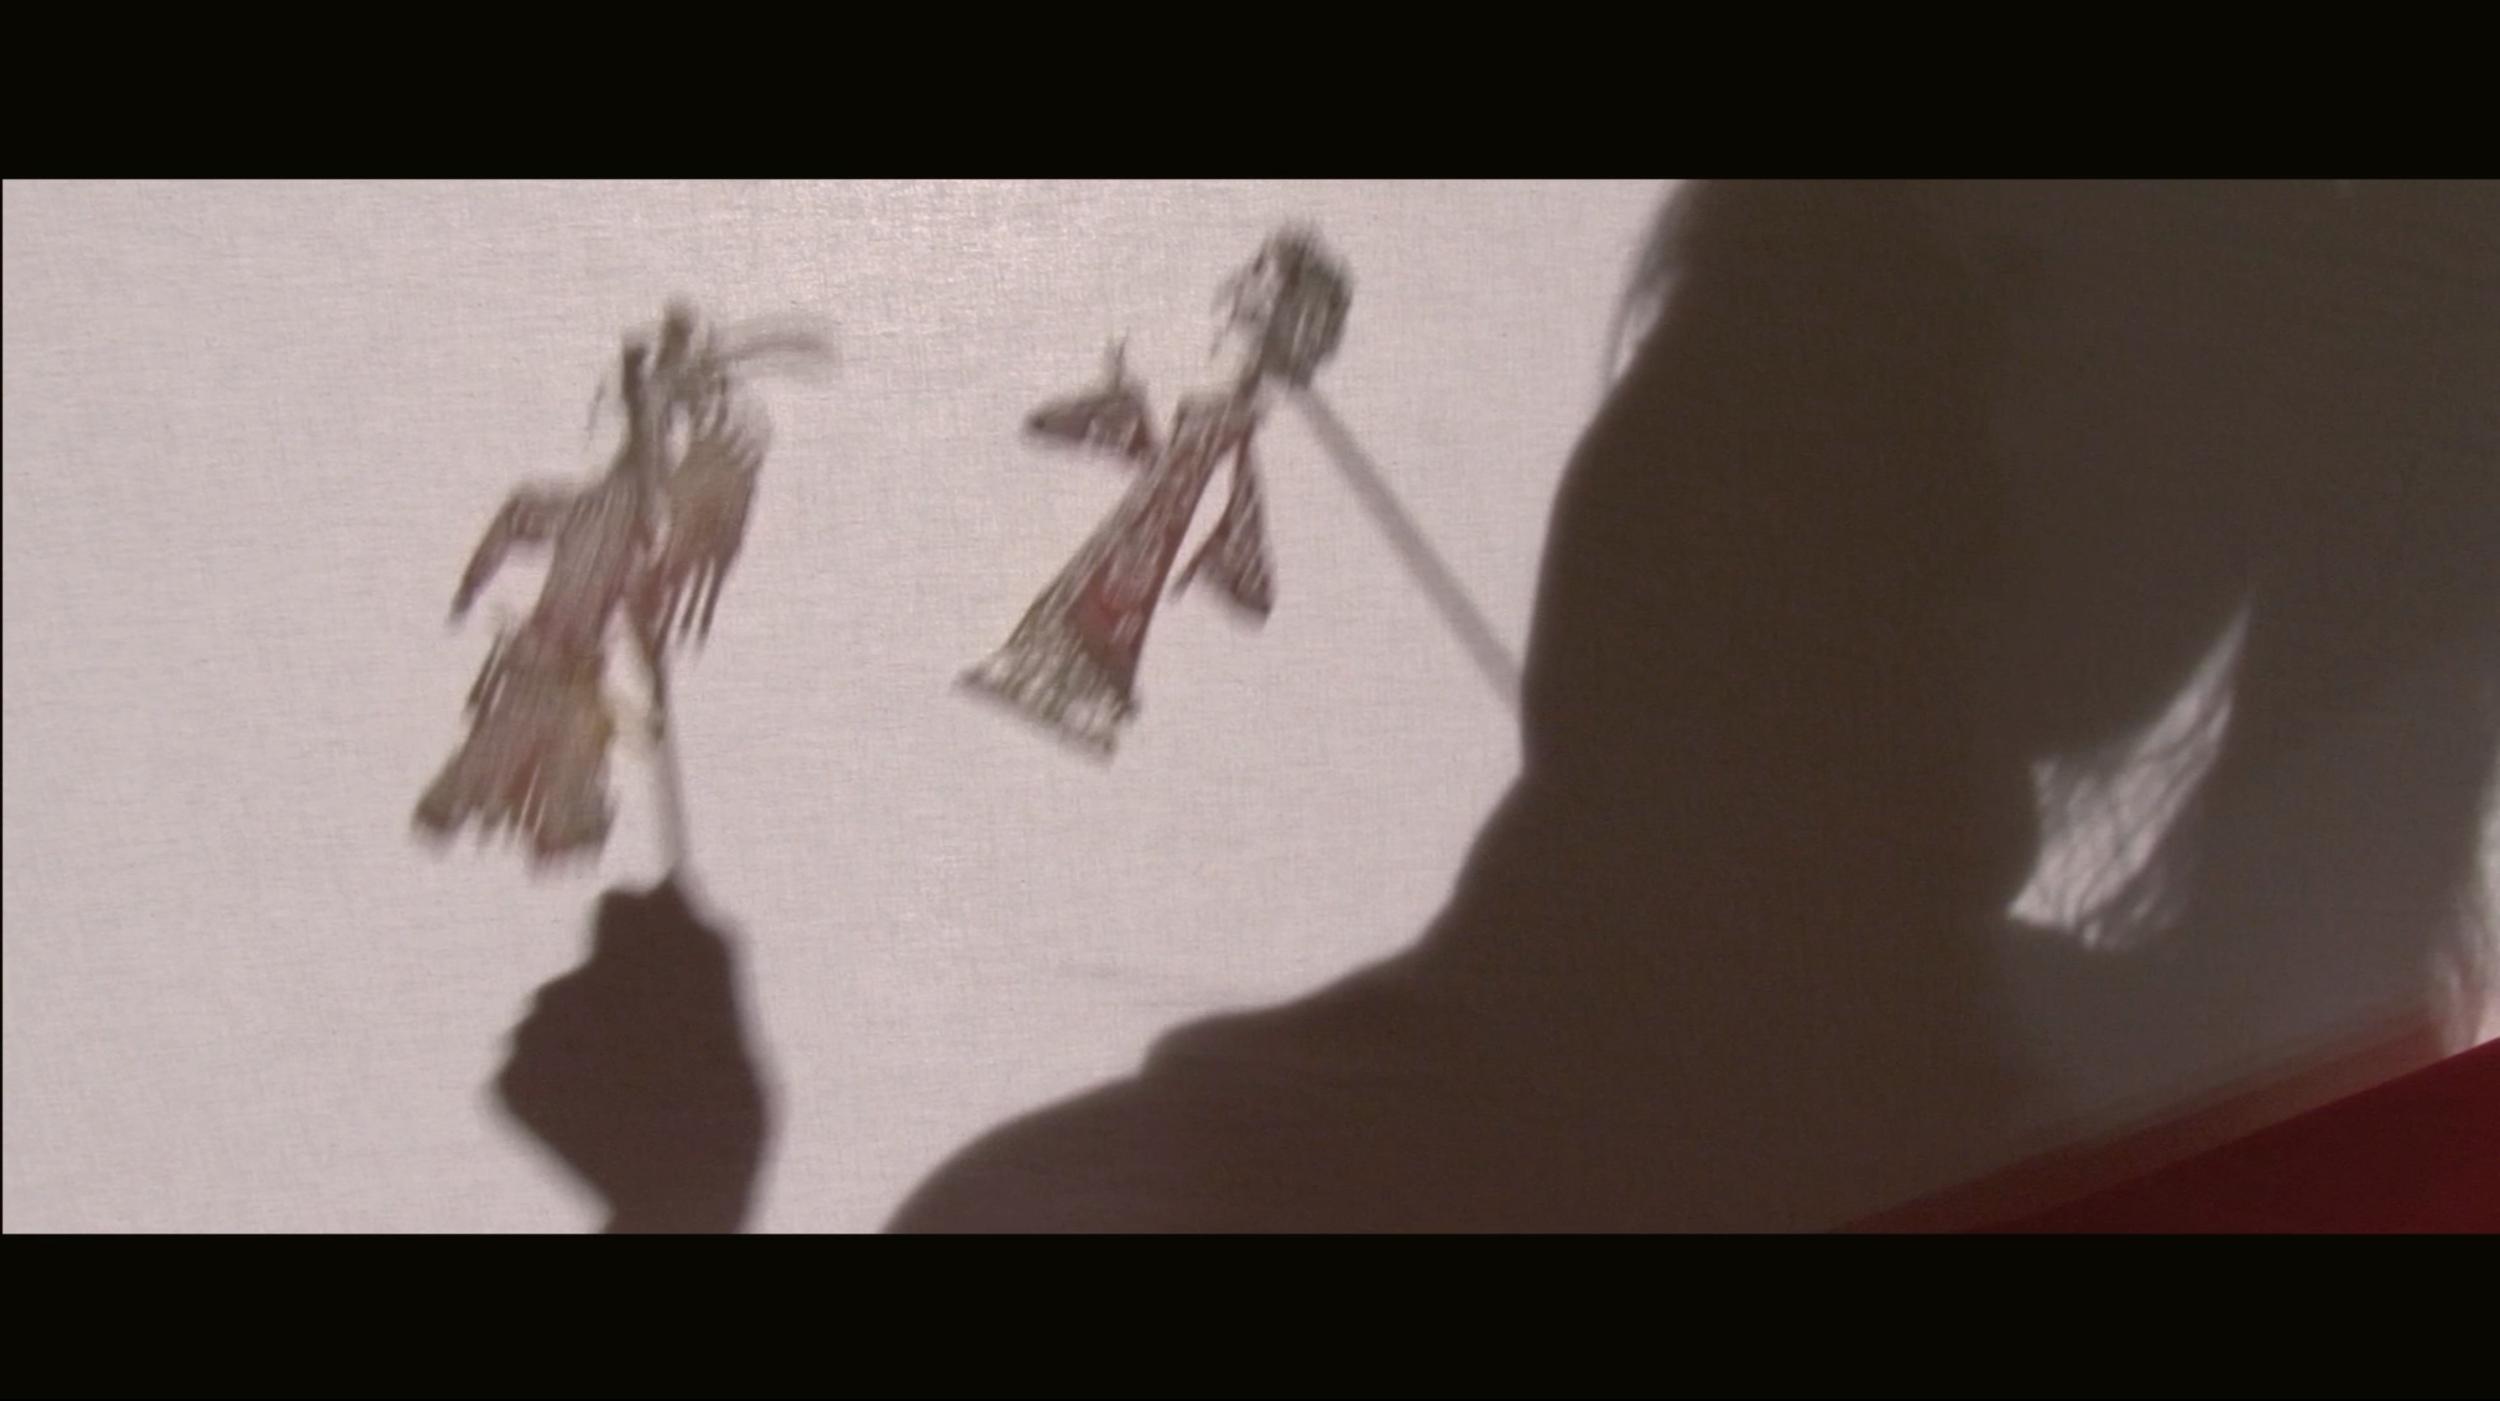 SHADOW GIRL  director, screenwriter, cinematographer, editor,producer.  music- 板胡; drum percussion from 张艺谋'91《大红灯笼高高挂》